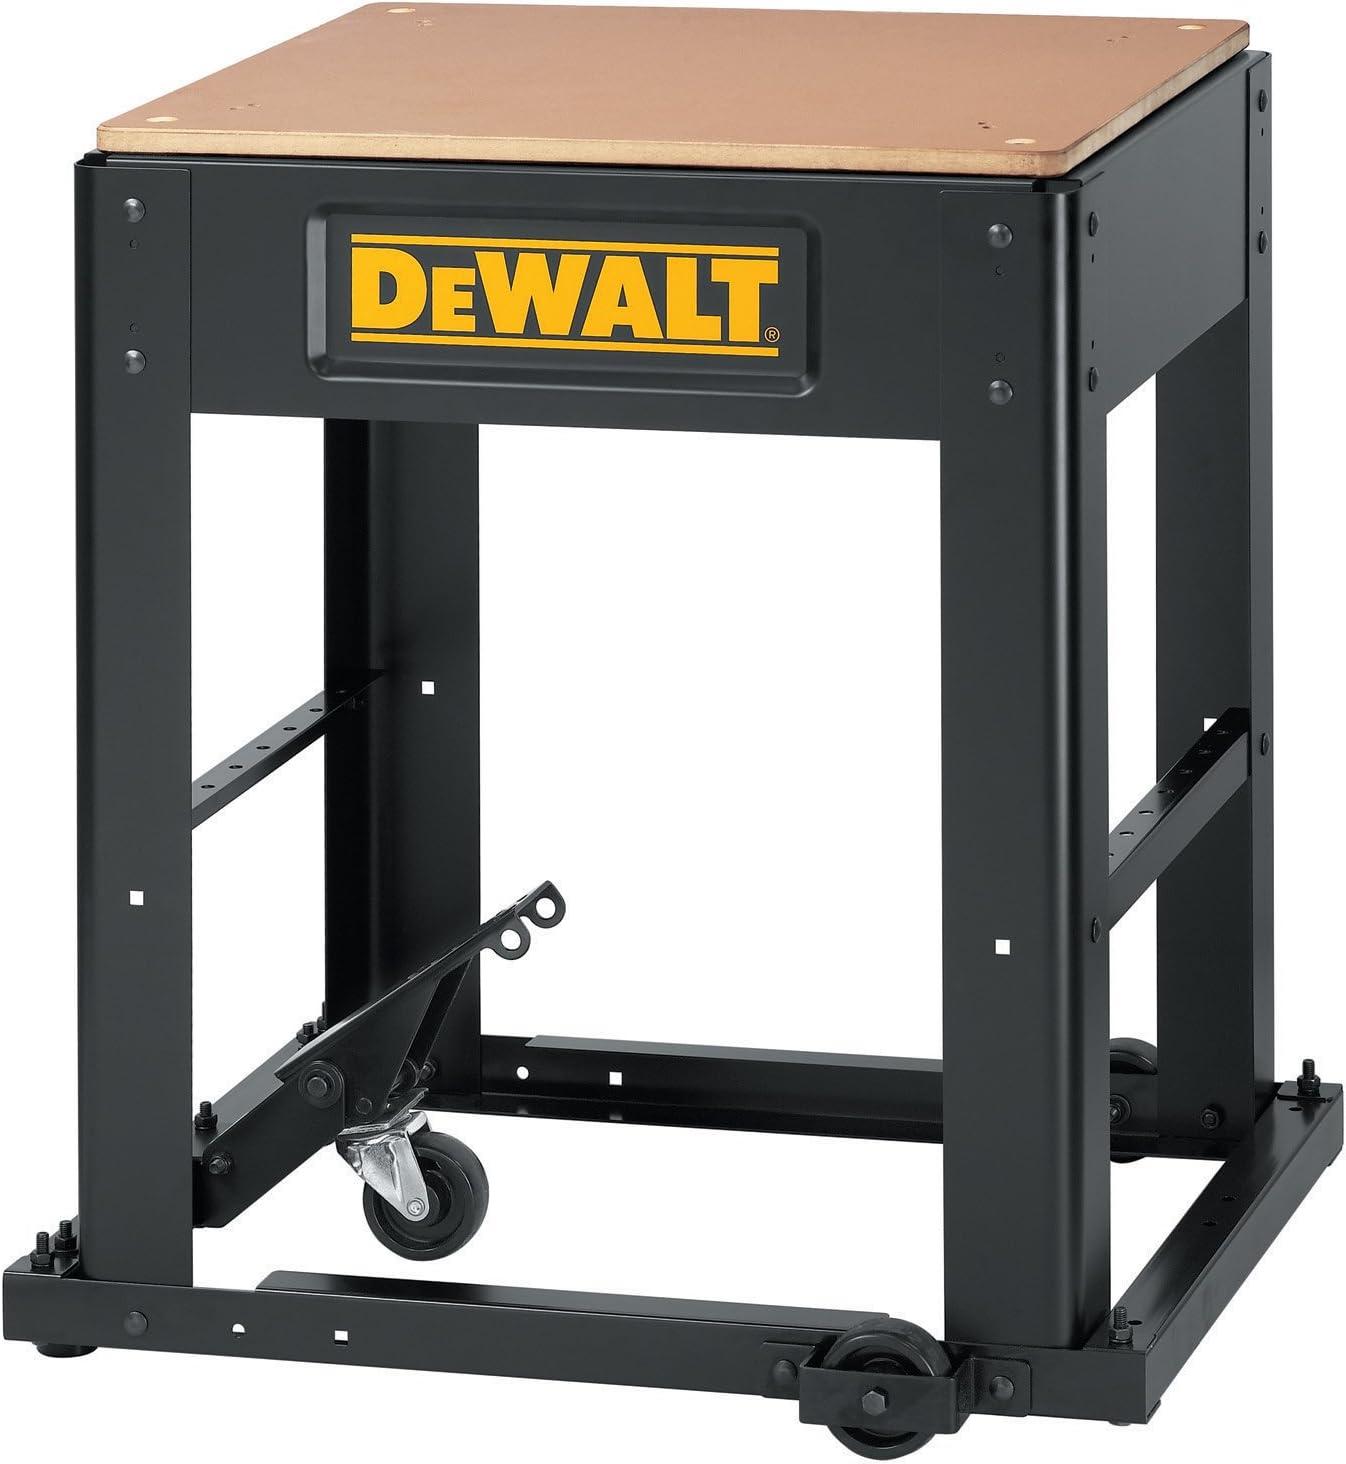 best drill press table: DEWALT DW7350 - a versatile choice